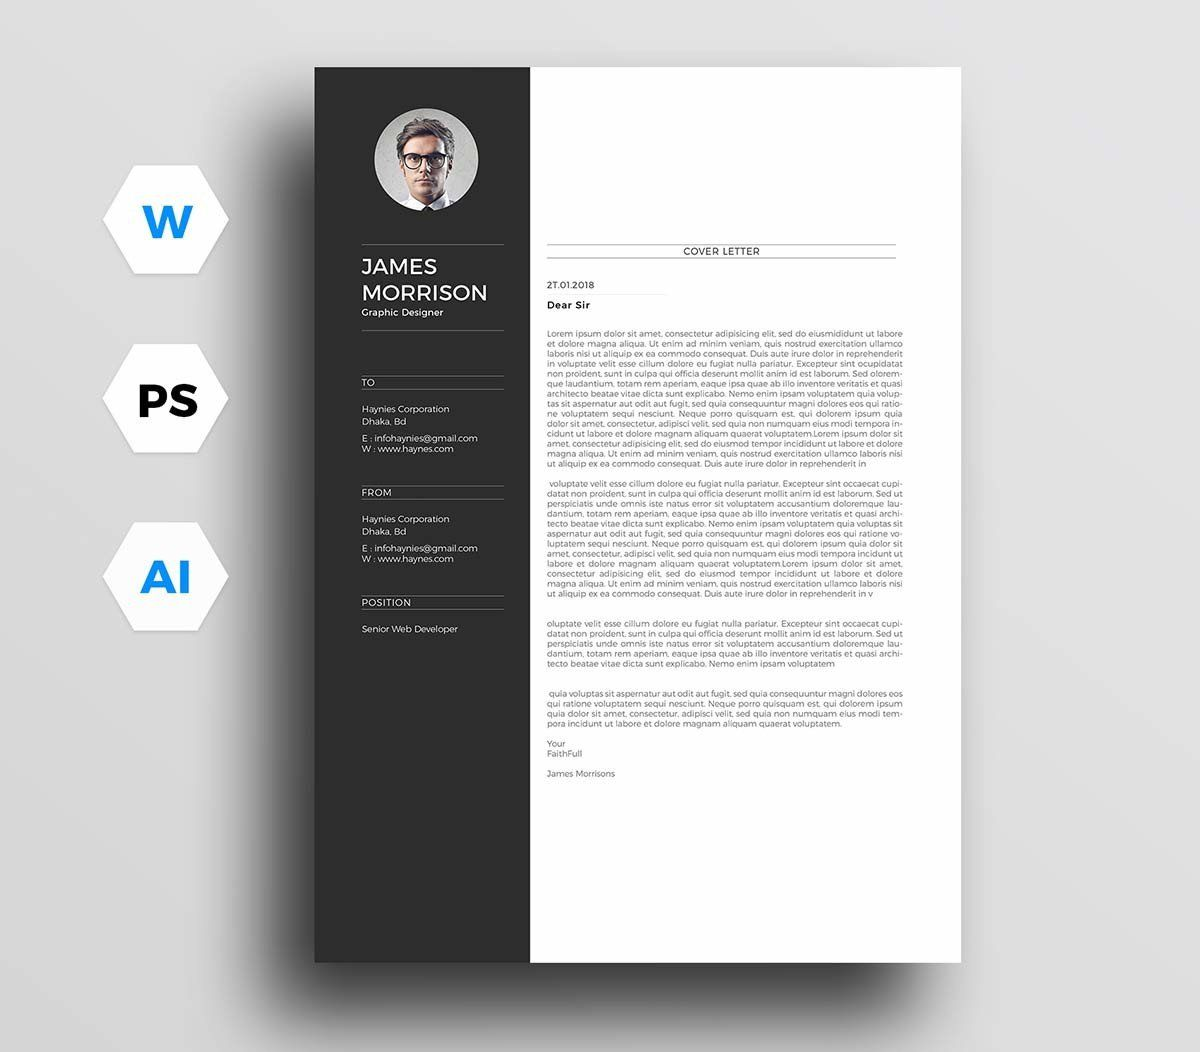 004 Breathtaking Window Resume Cover Letter Template Design  TemplatesFull